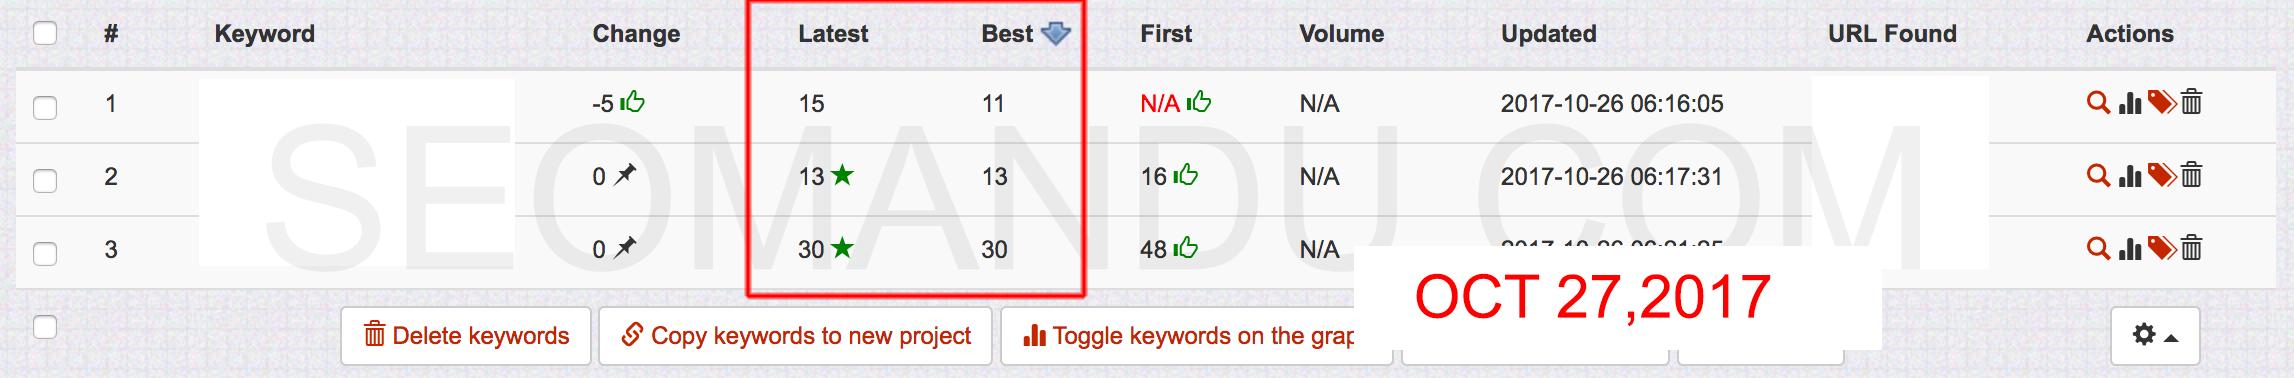 27 oct, 2017 keywords update seomandu google.com.np